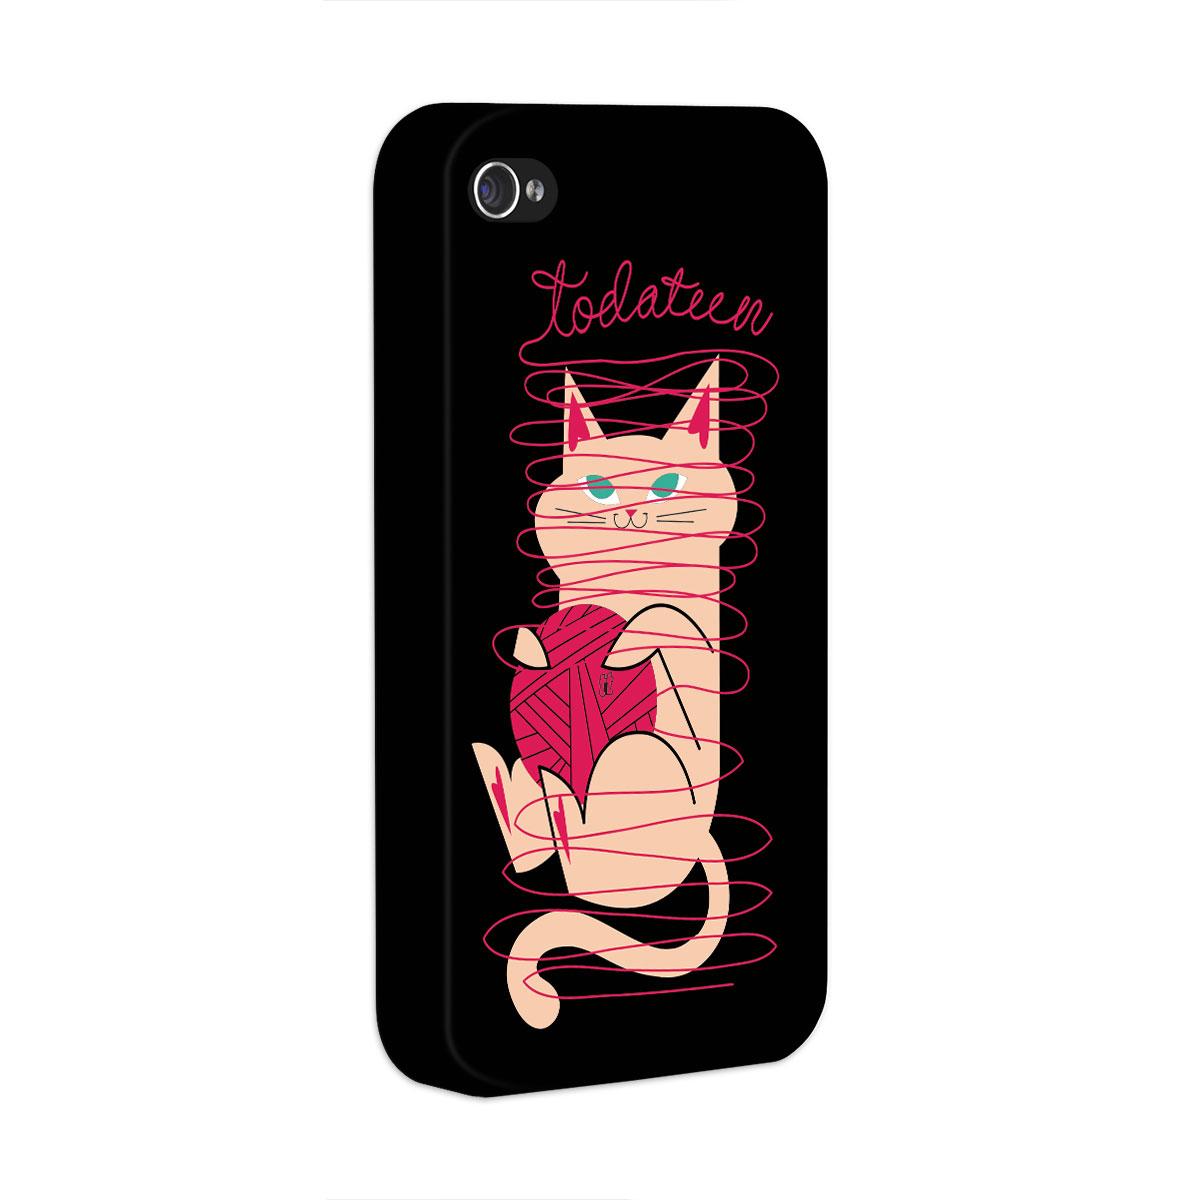 Capa para iPhone 4/4S TodaTeen Cat